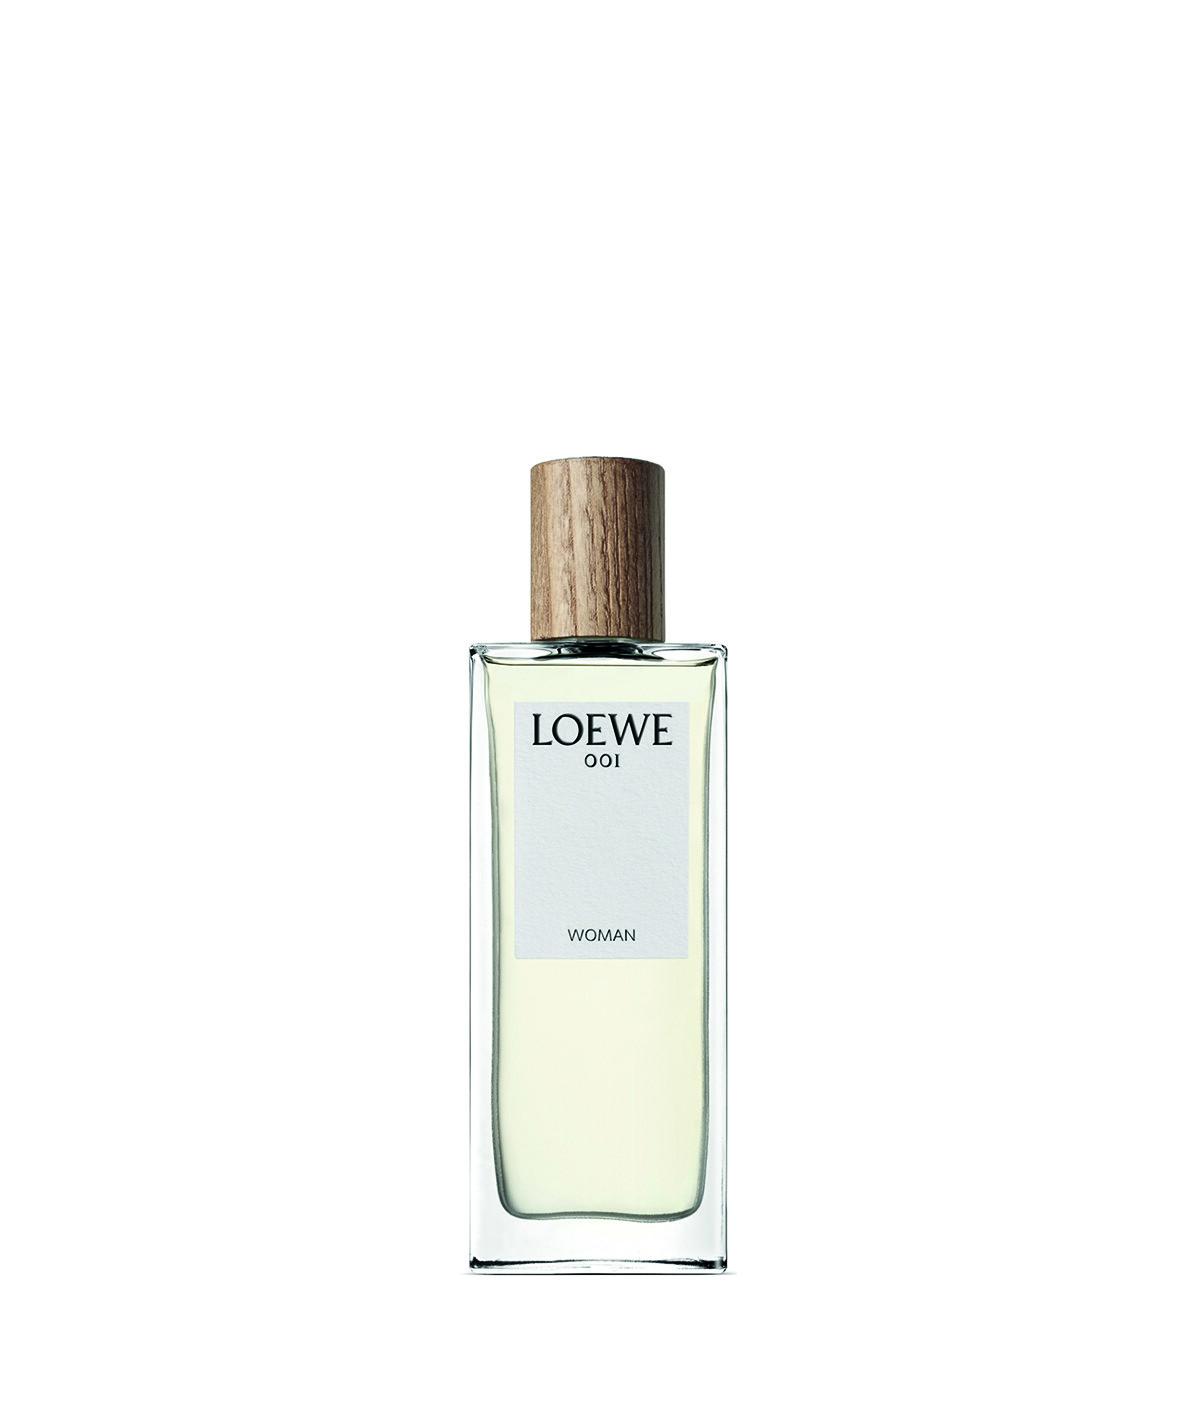 LOEWE Loewe 001 Woman Edp 50Ml colourless front